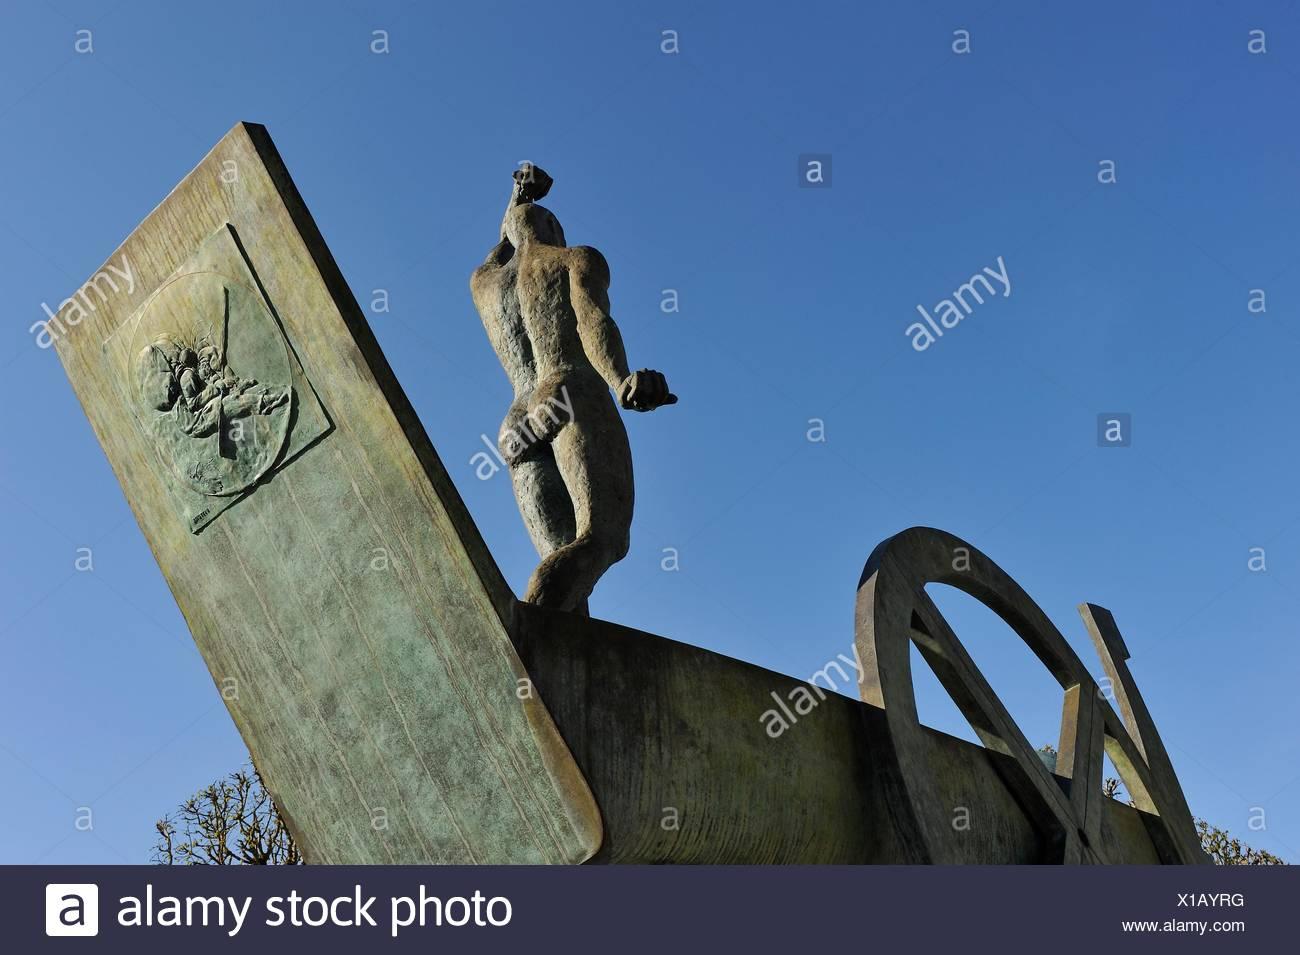 ´´Barque Solaire´´ work by the Franco-Czech sculptor Karel Zlin, Castle ´s park of Rambouillet, Department of Yvelines, Region of Ile-de-France, - Stock Image